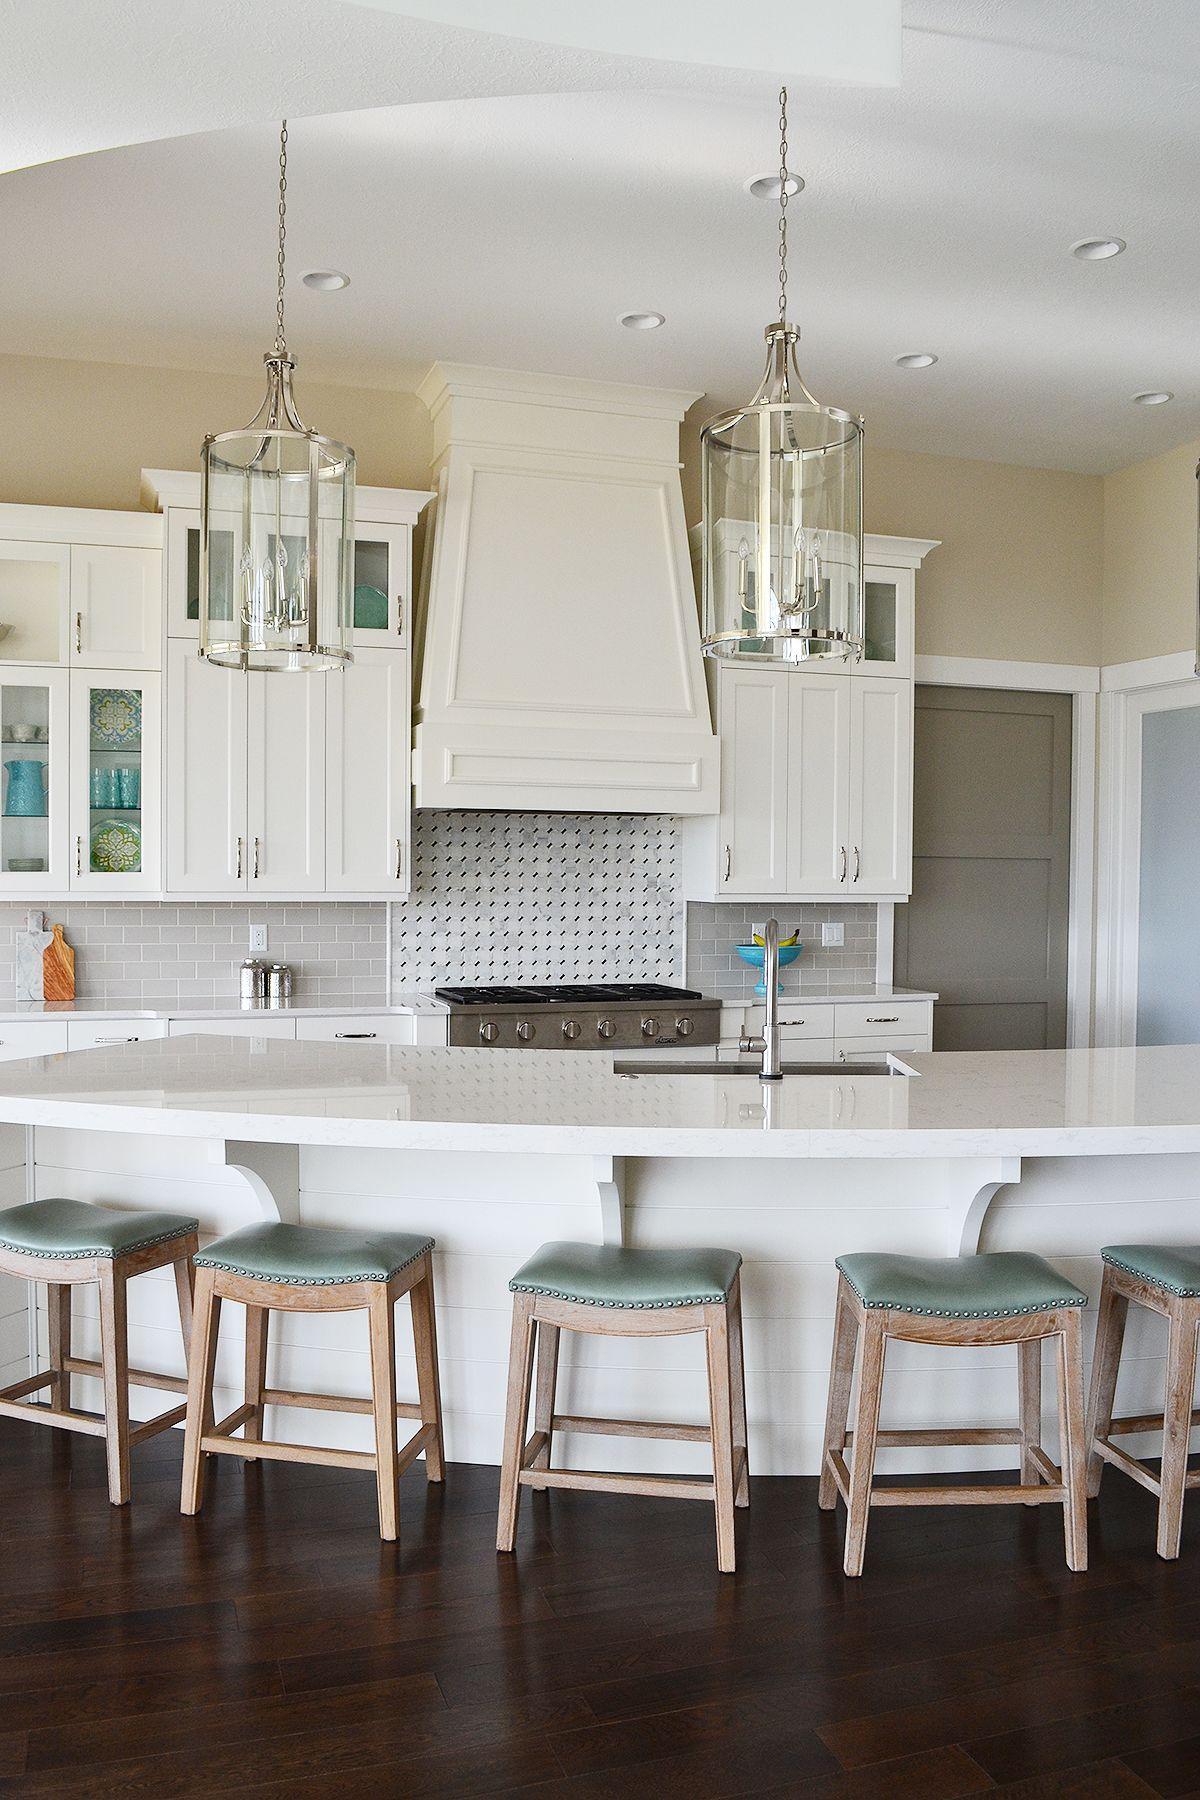 foxtrotter two project sita montgomery interiors kitchen